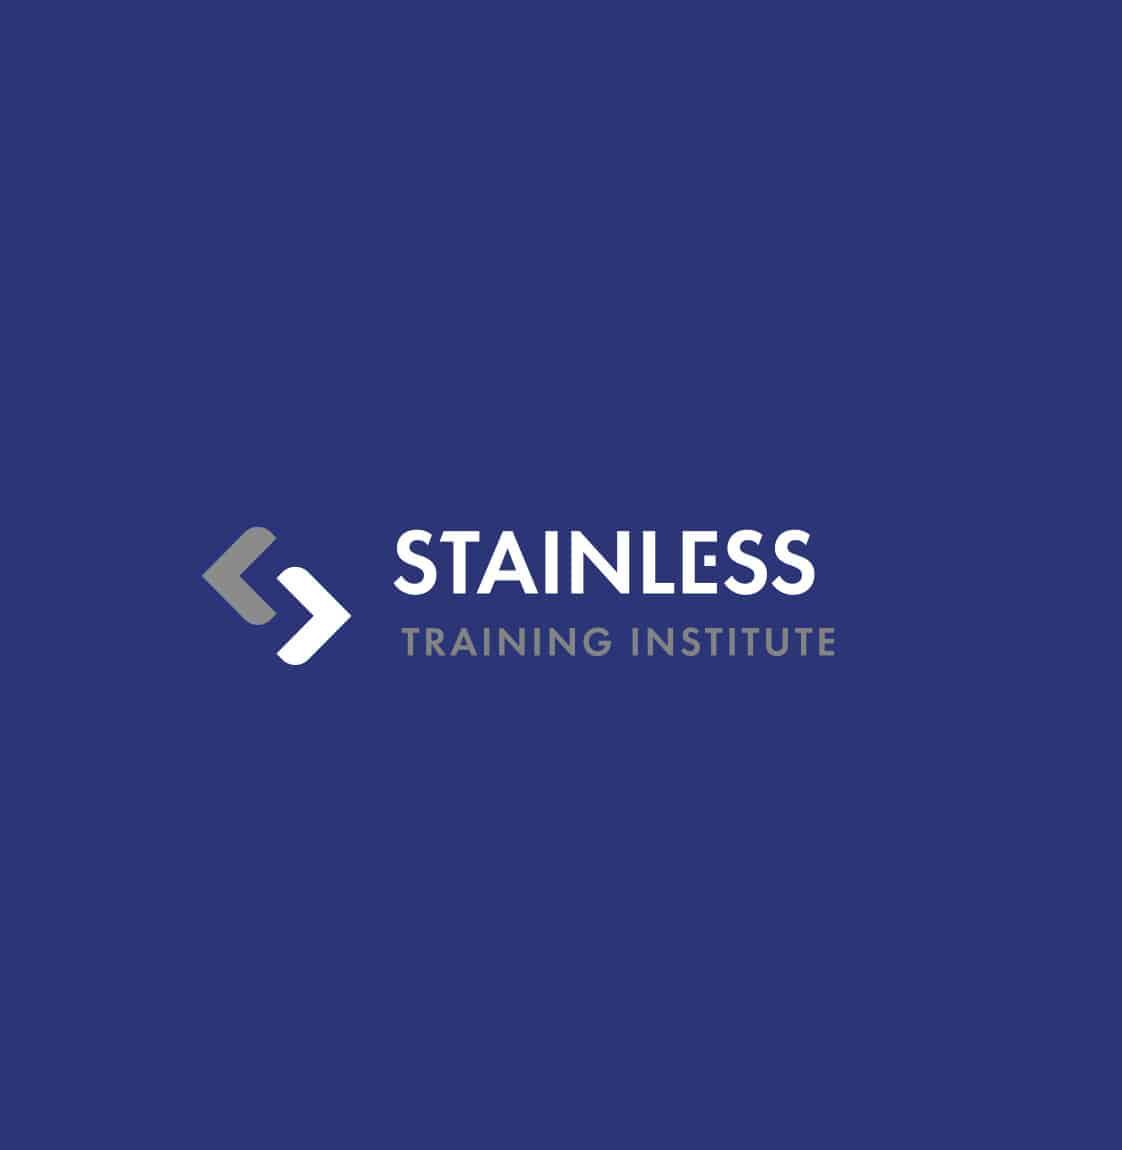 STAINLESS Training Institute